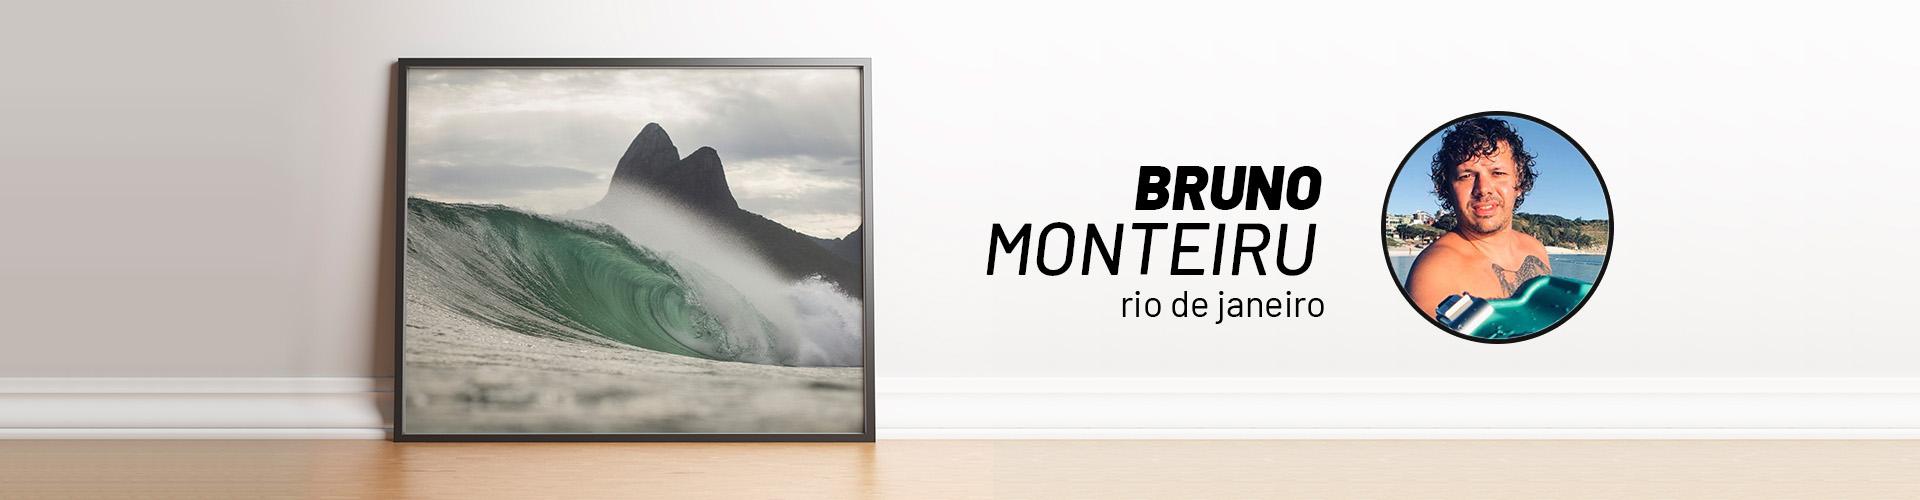 Página Artista | Bruno Monteiru